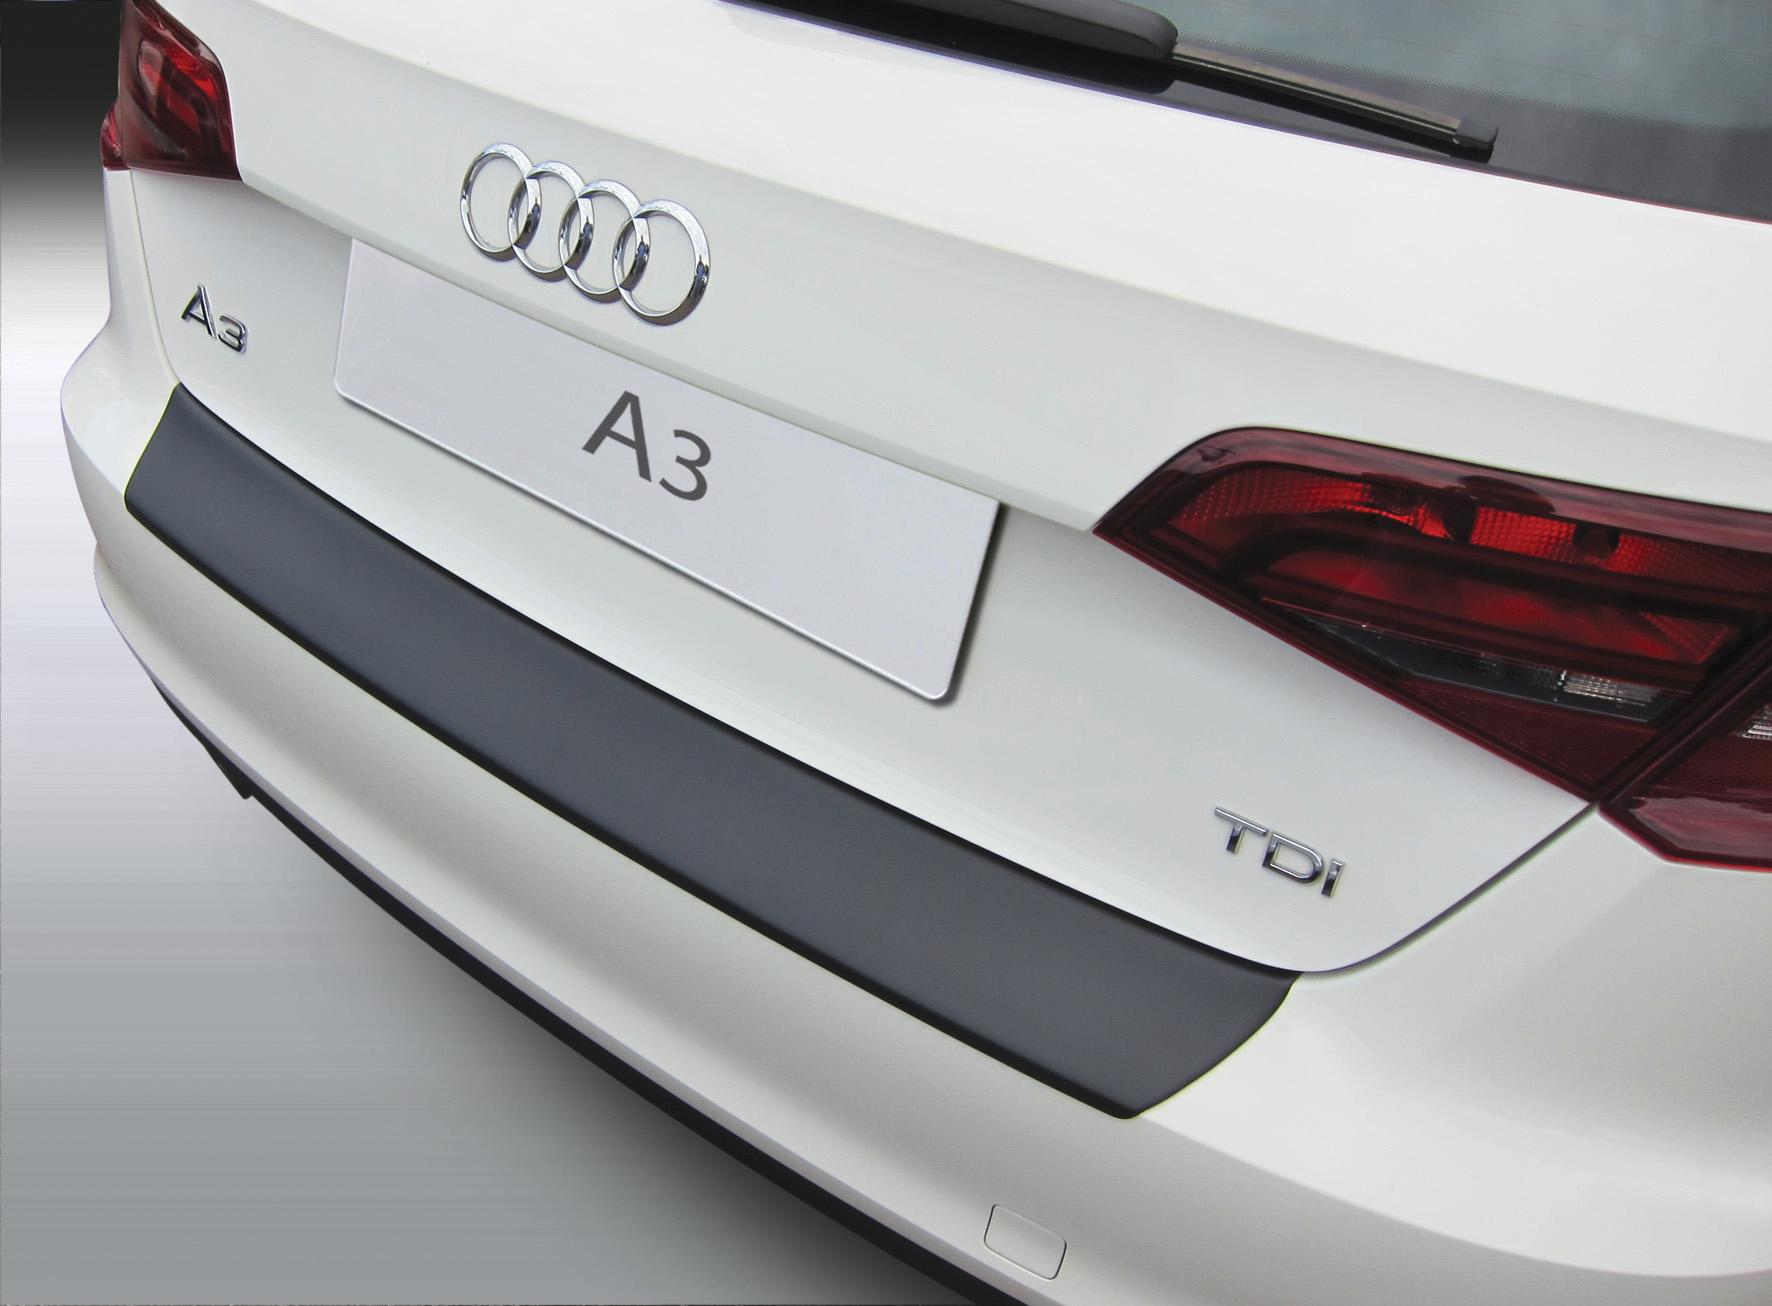 Накладка на задний бампер Audi A3 / S3 / RS, 5-дв. хэтчбек, 2012-2018